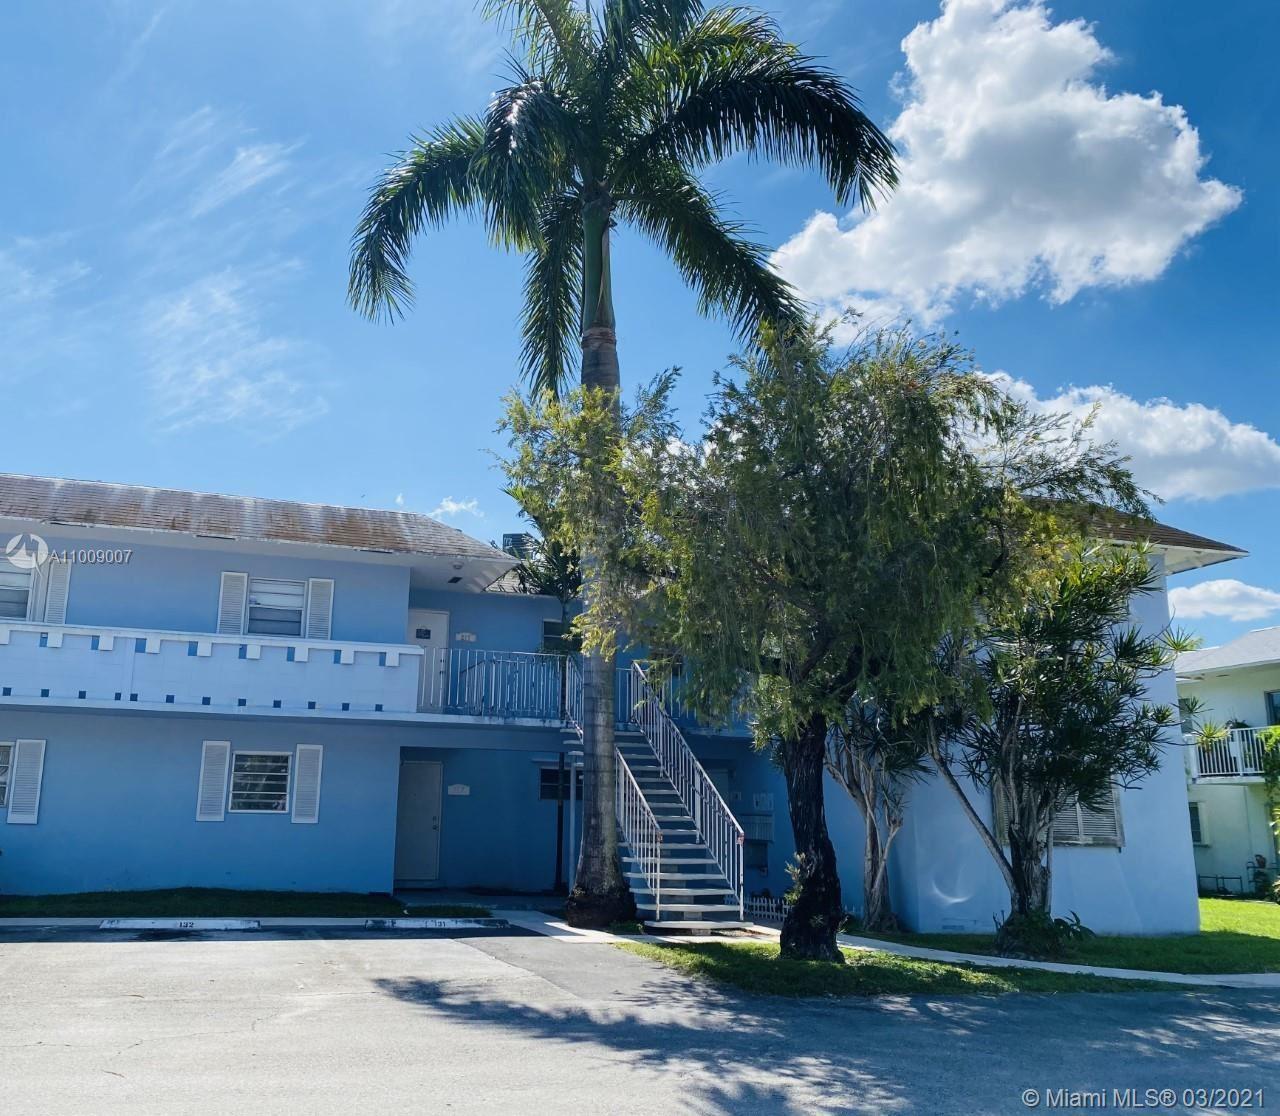 7580 SW 82nd St #F-117, Miami, FL 33143 - #: A11009007